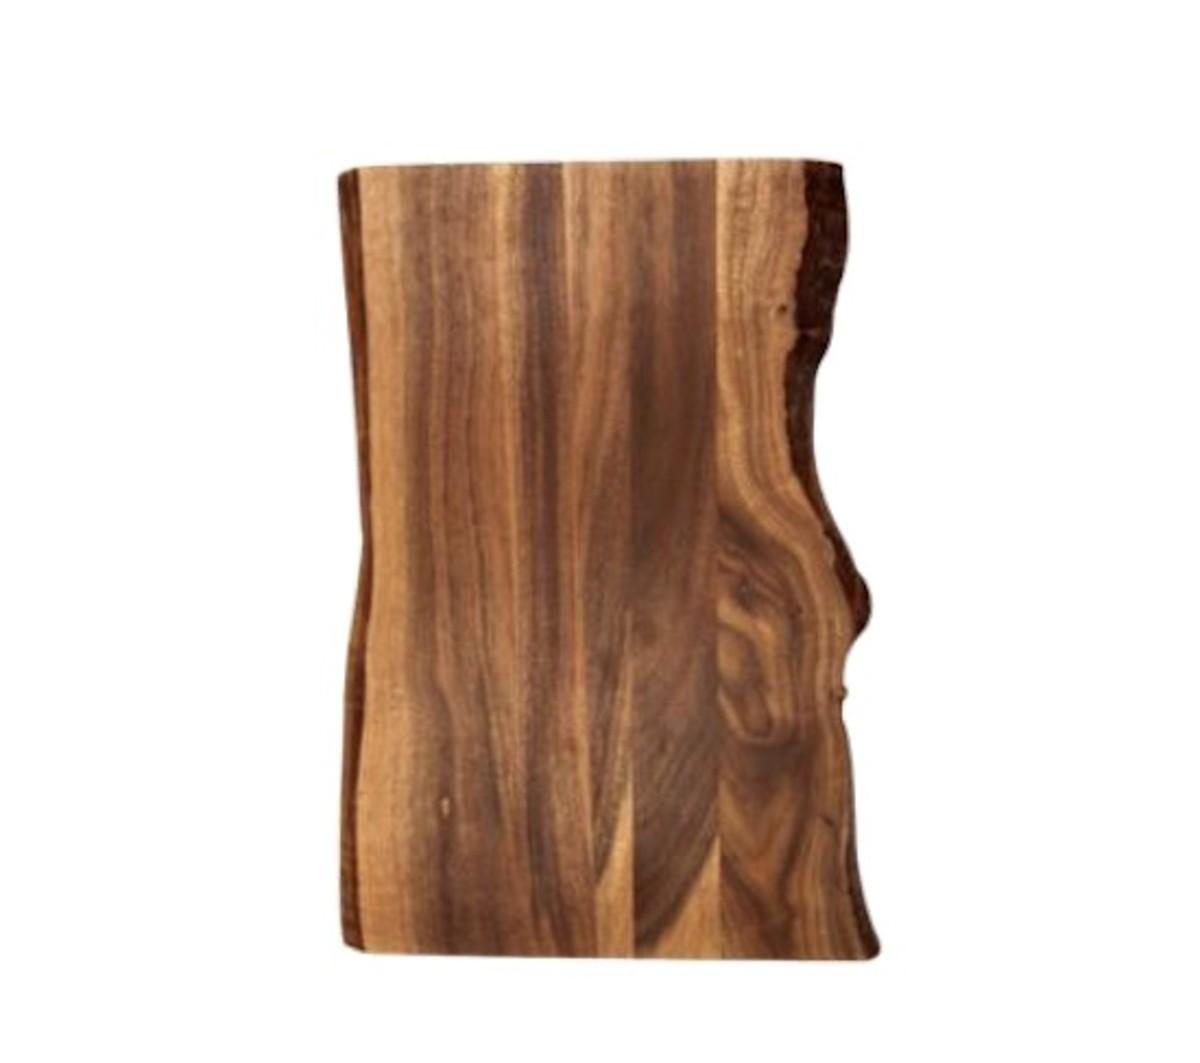 Lux & Eco, cutting board